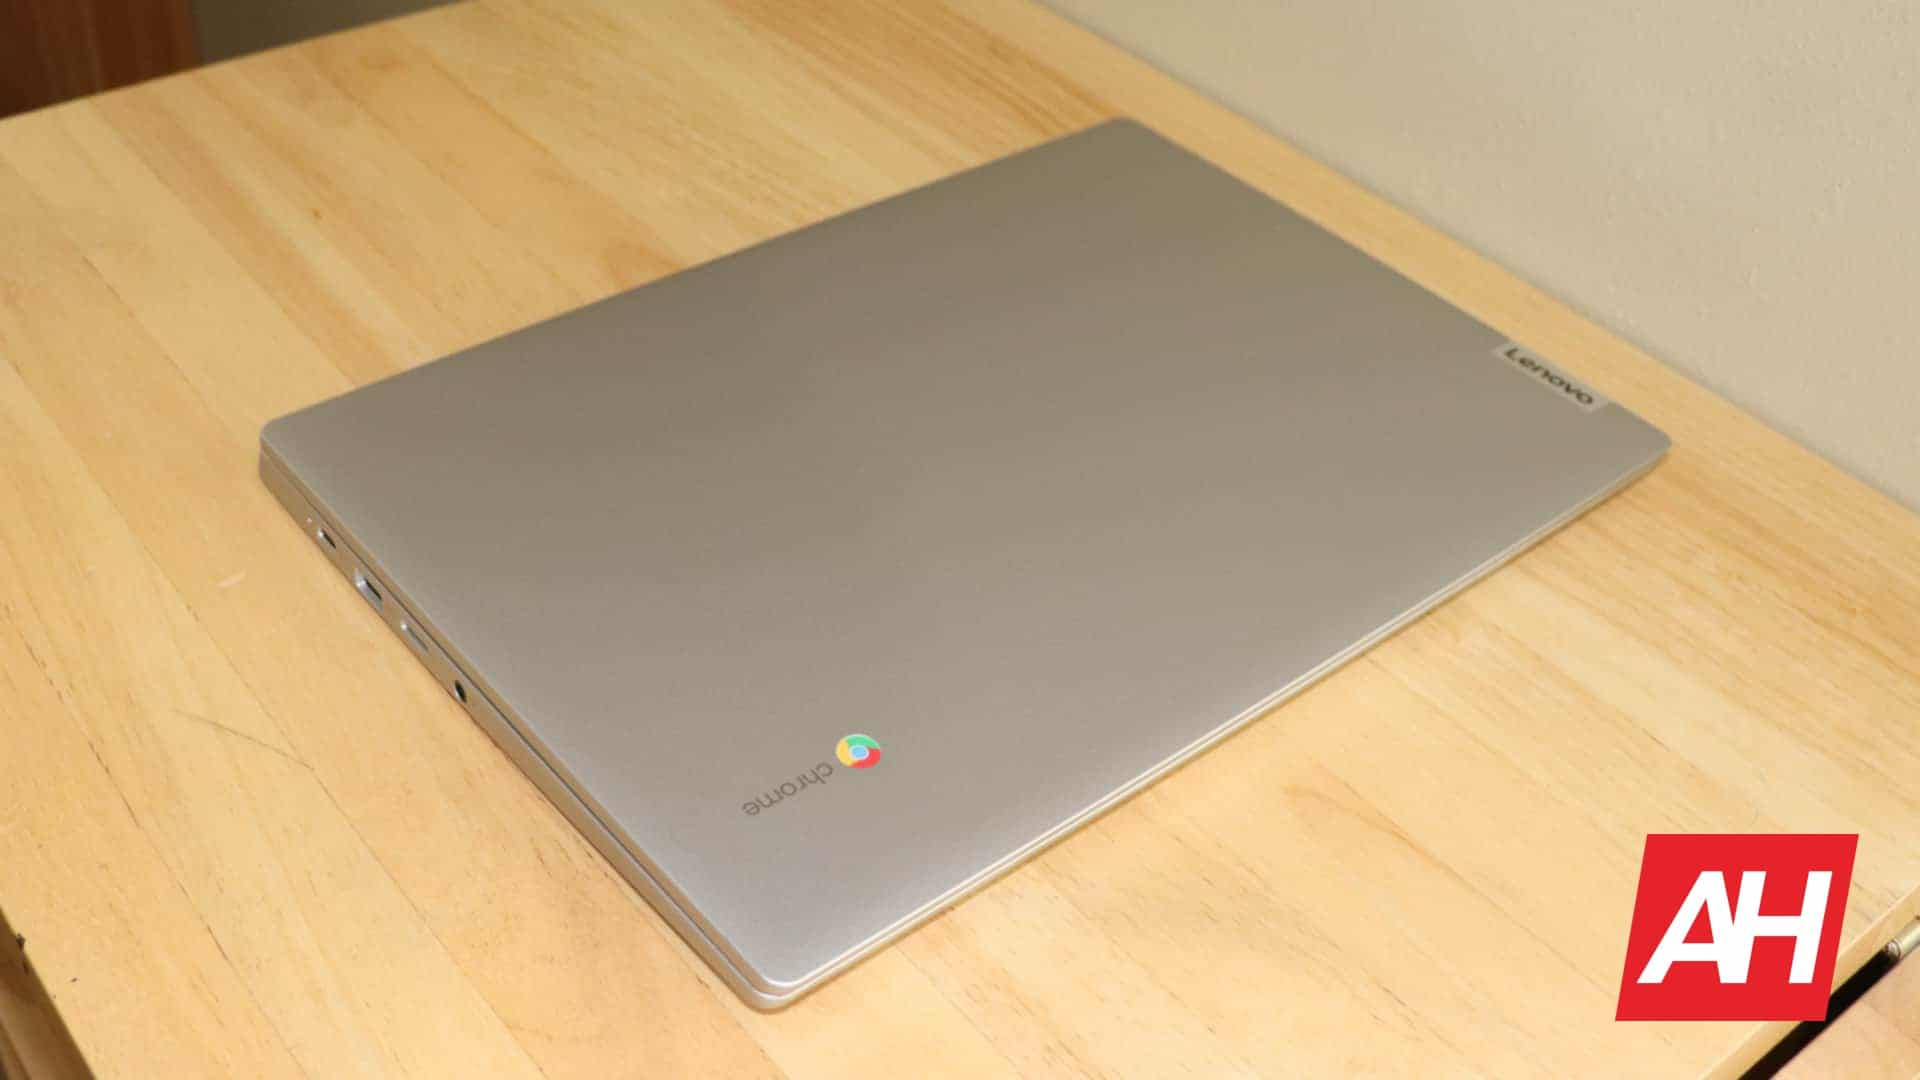 01 2 Lenovo IdeaPad 3 14 Chromebook AH 2020